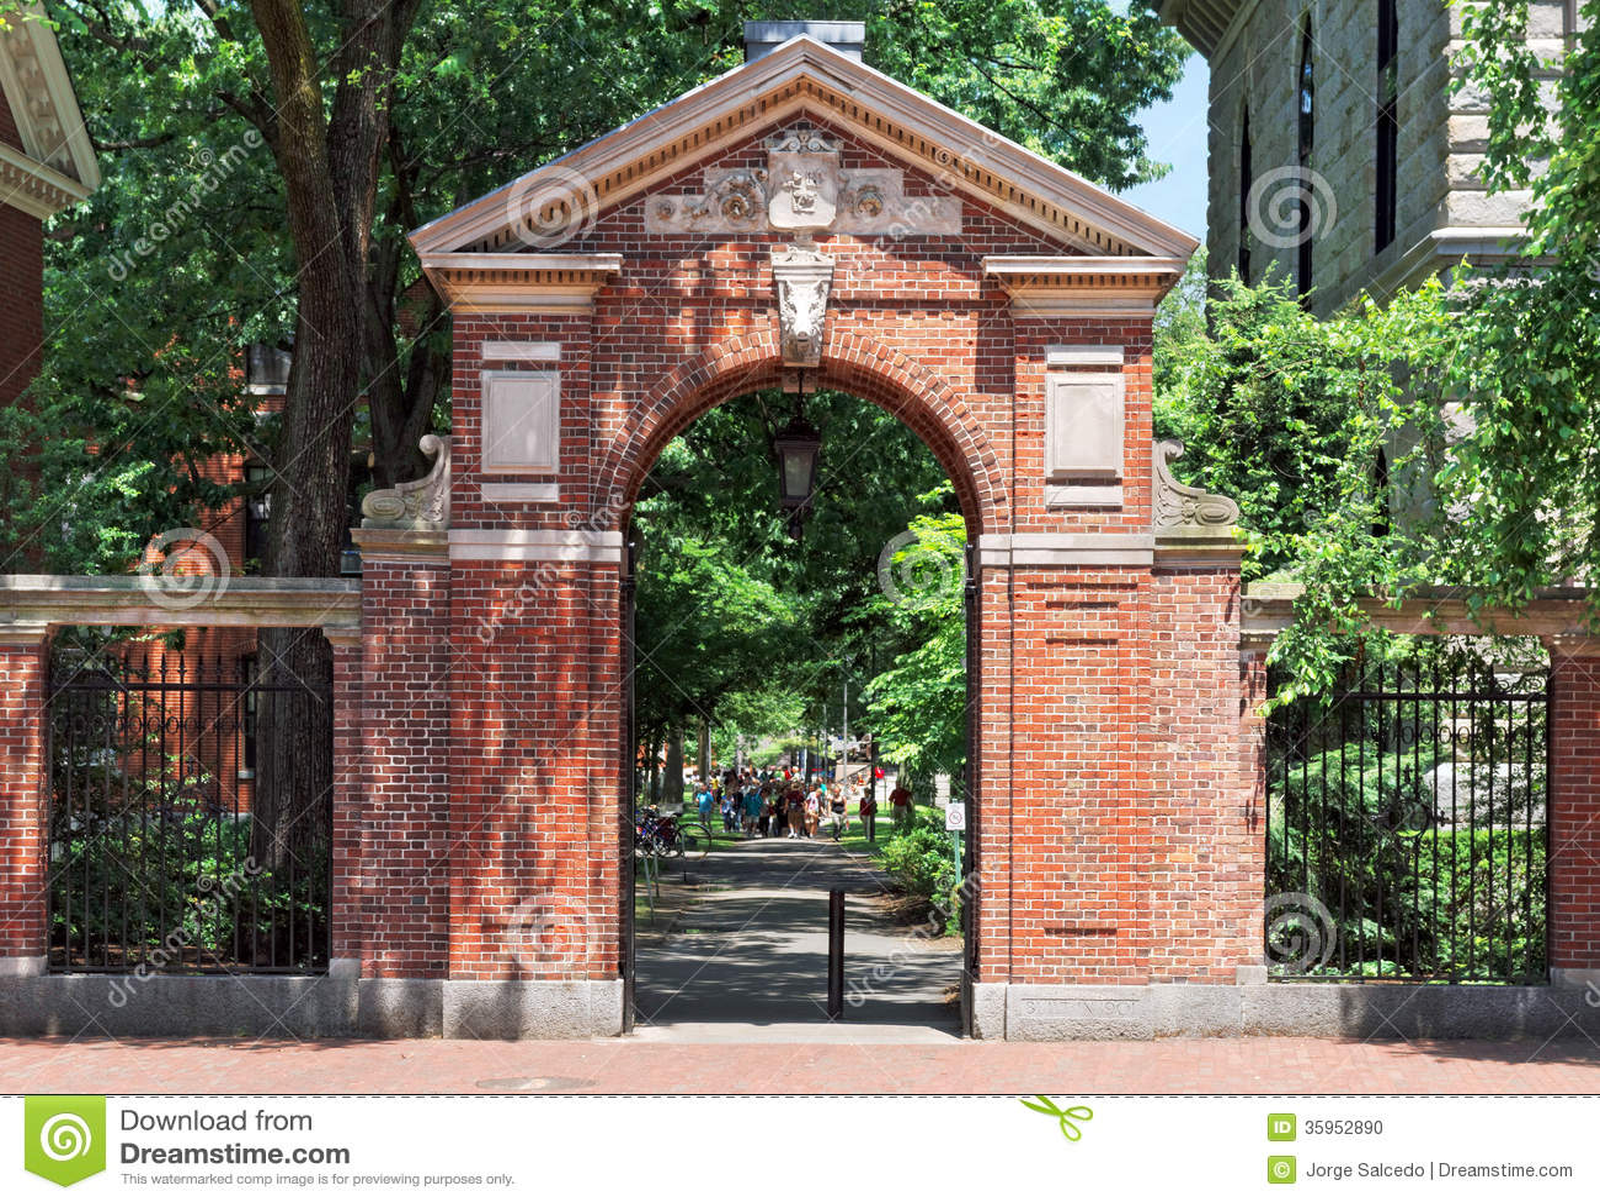 A Harvard